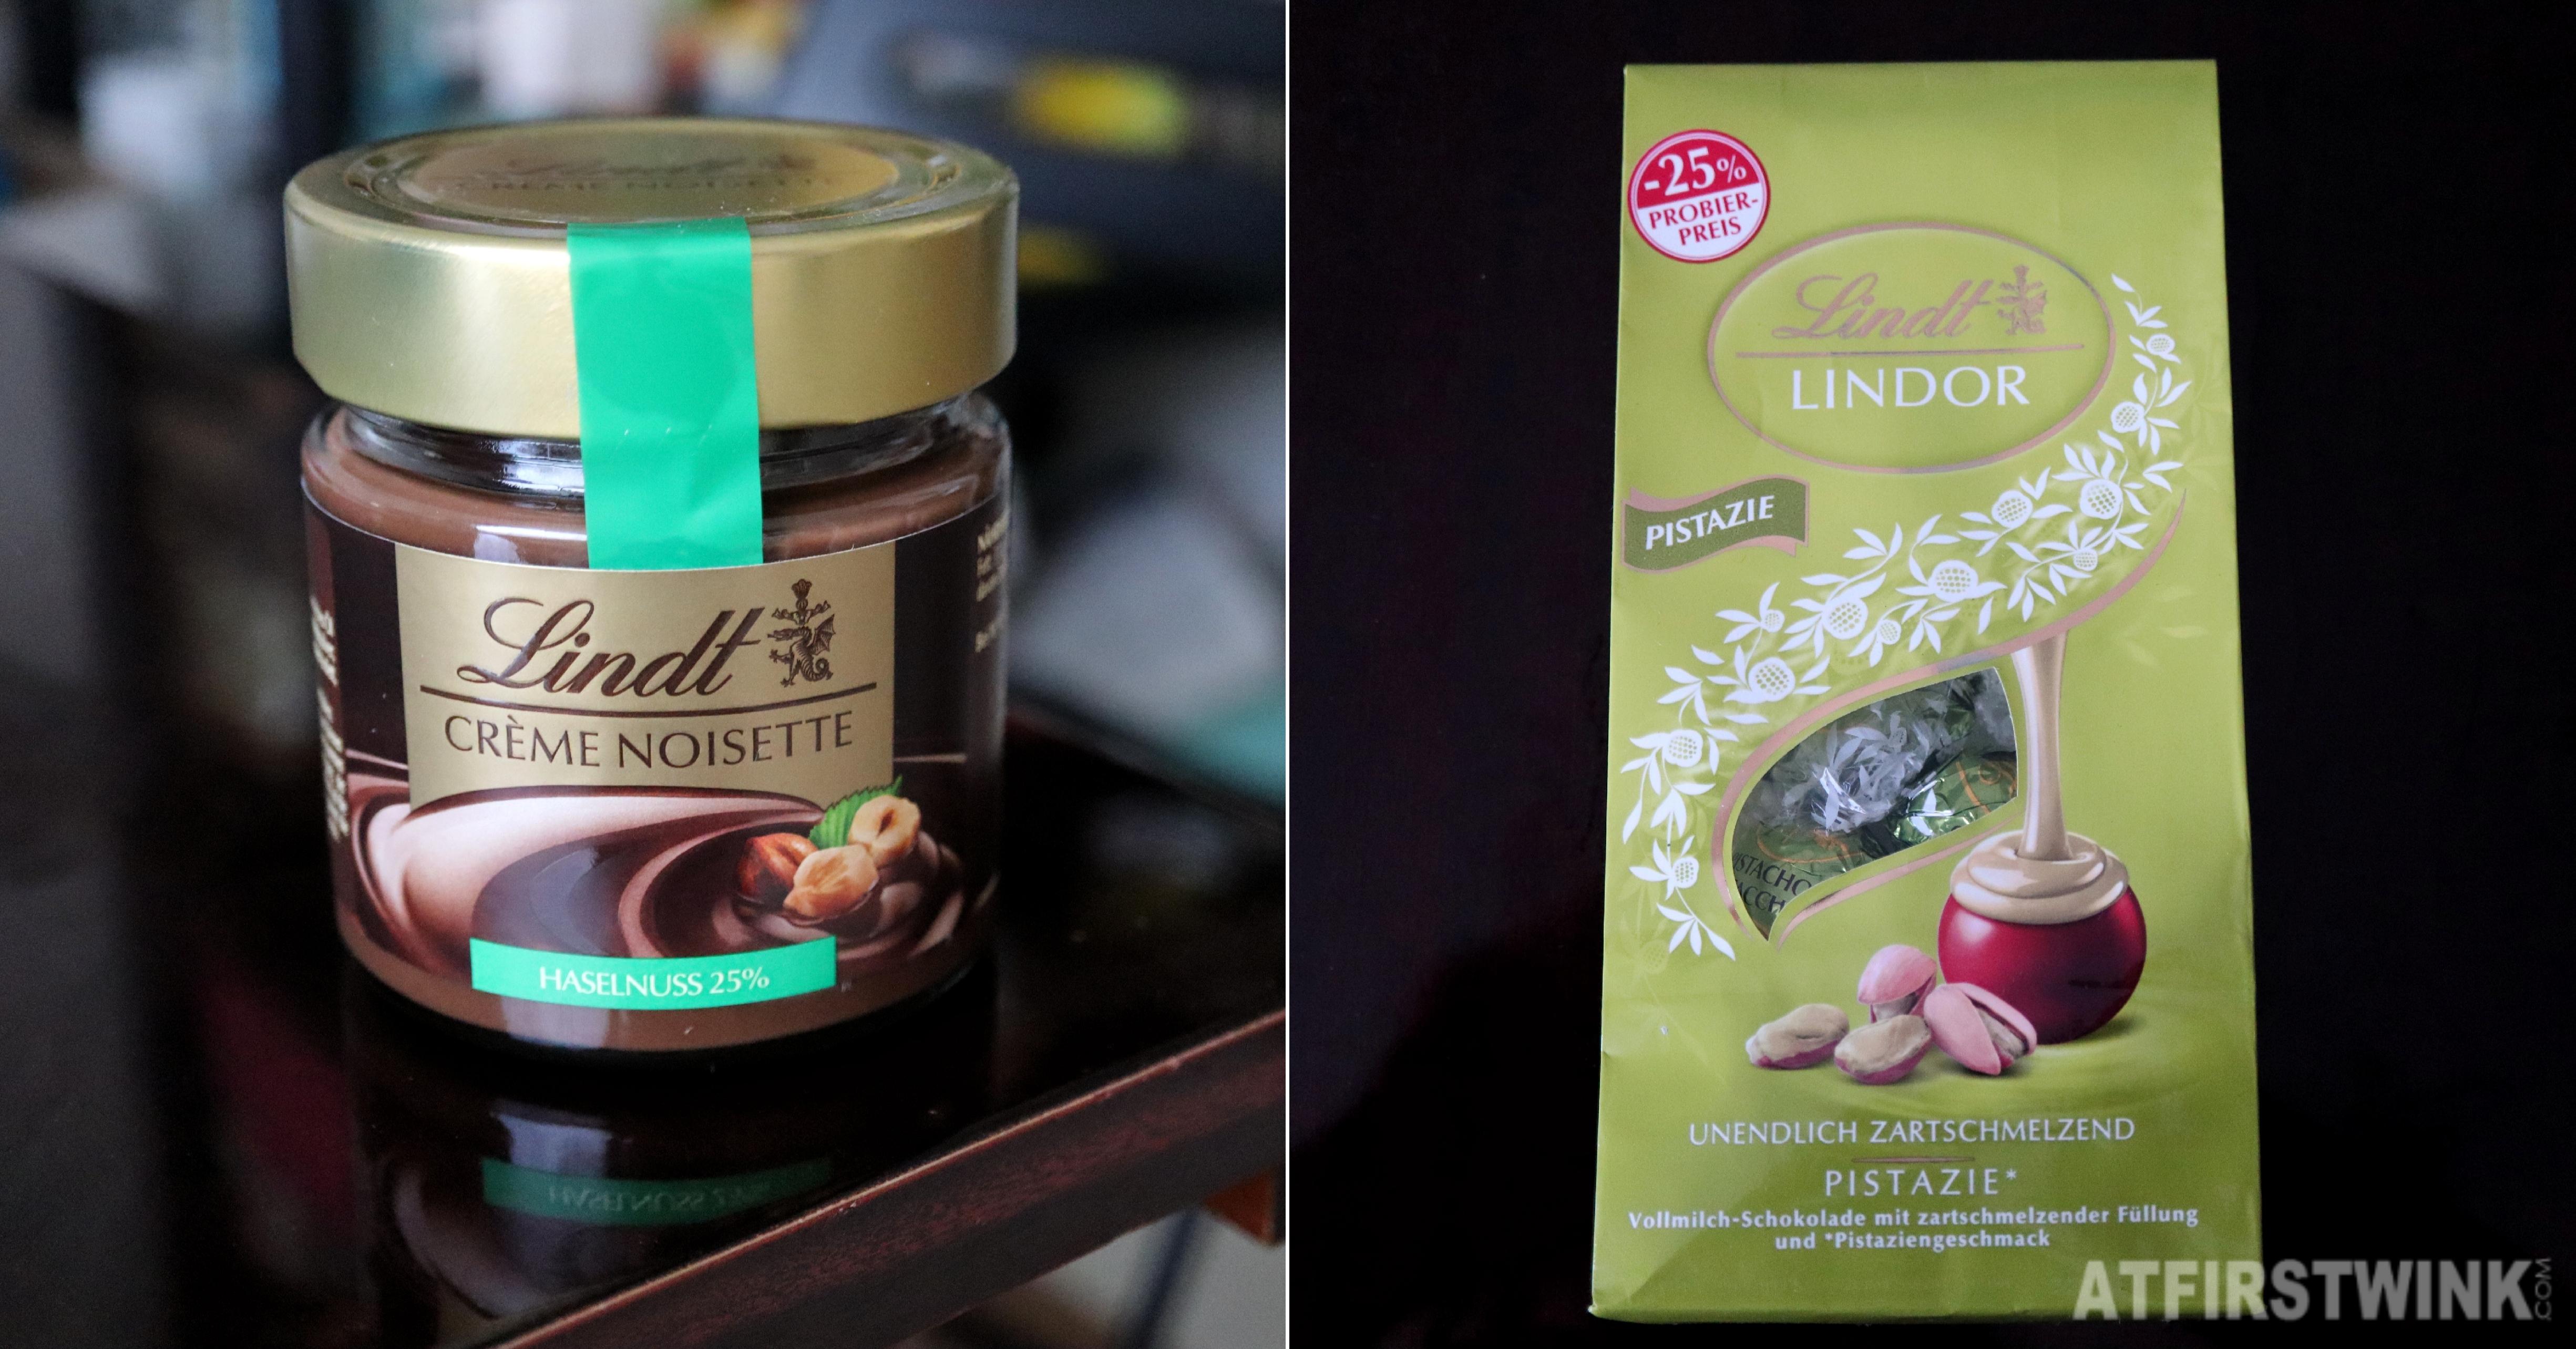 Lindt lindor pistachio chocolate truffles hazelnut chocolate spread